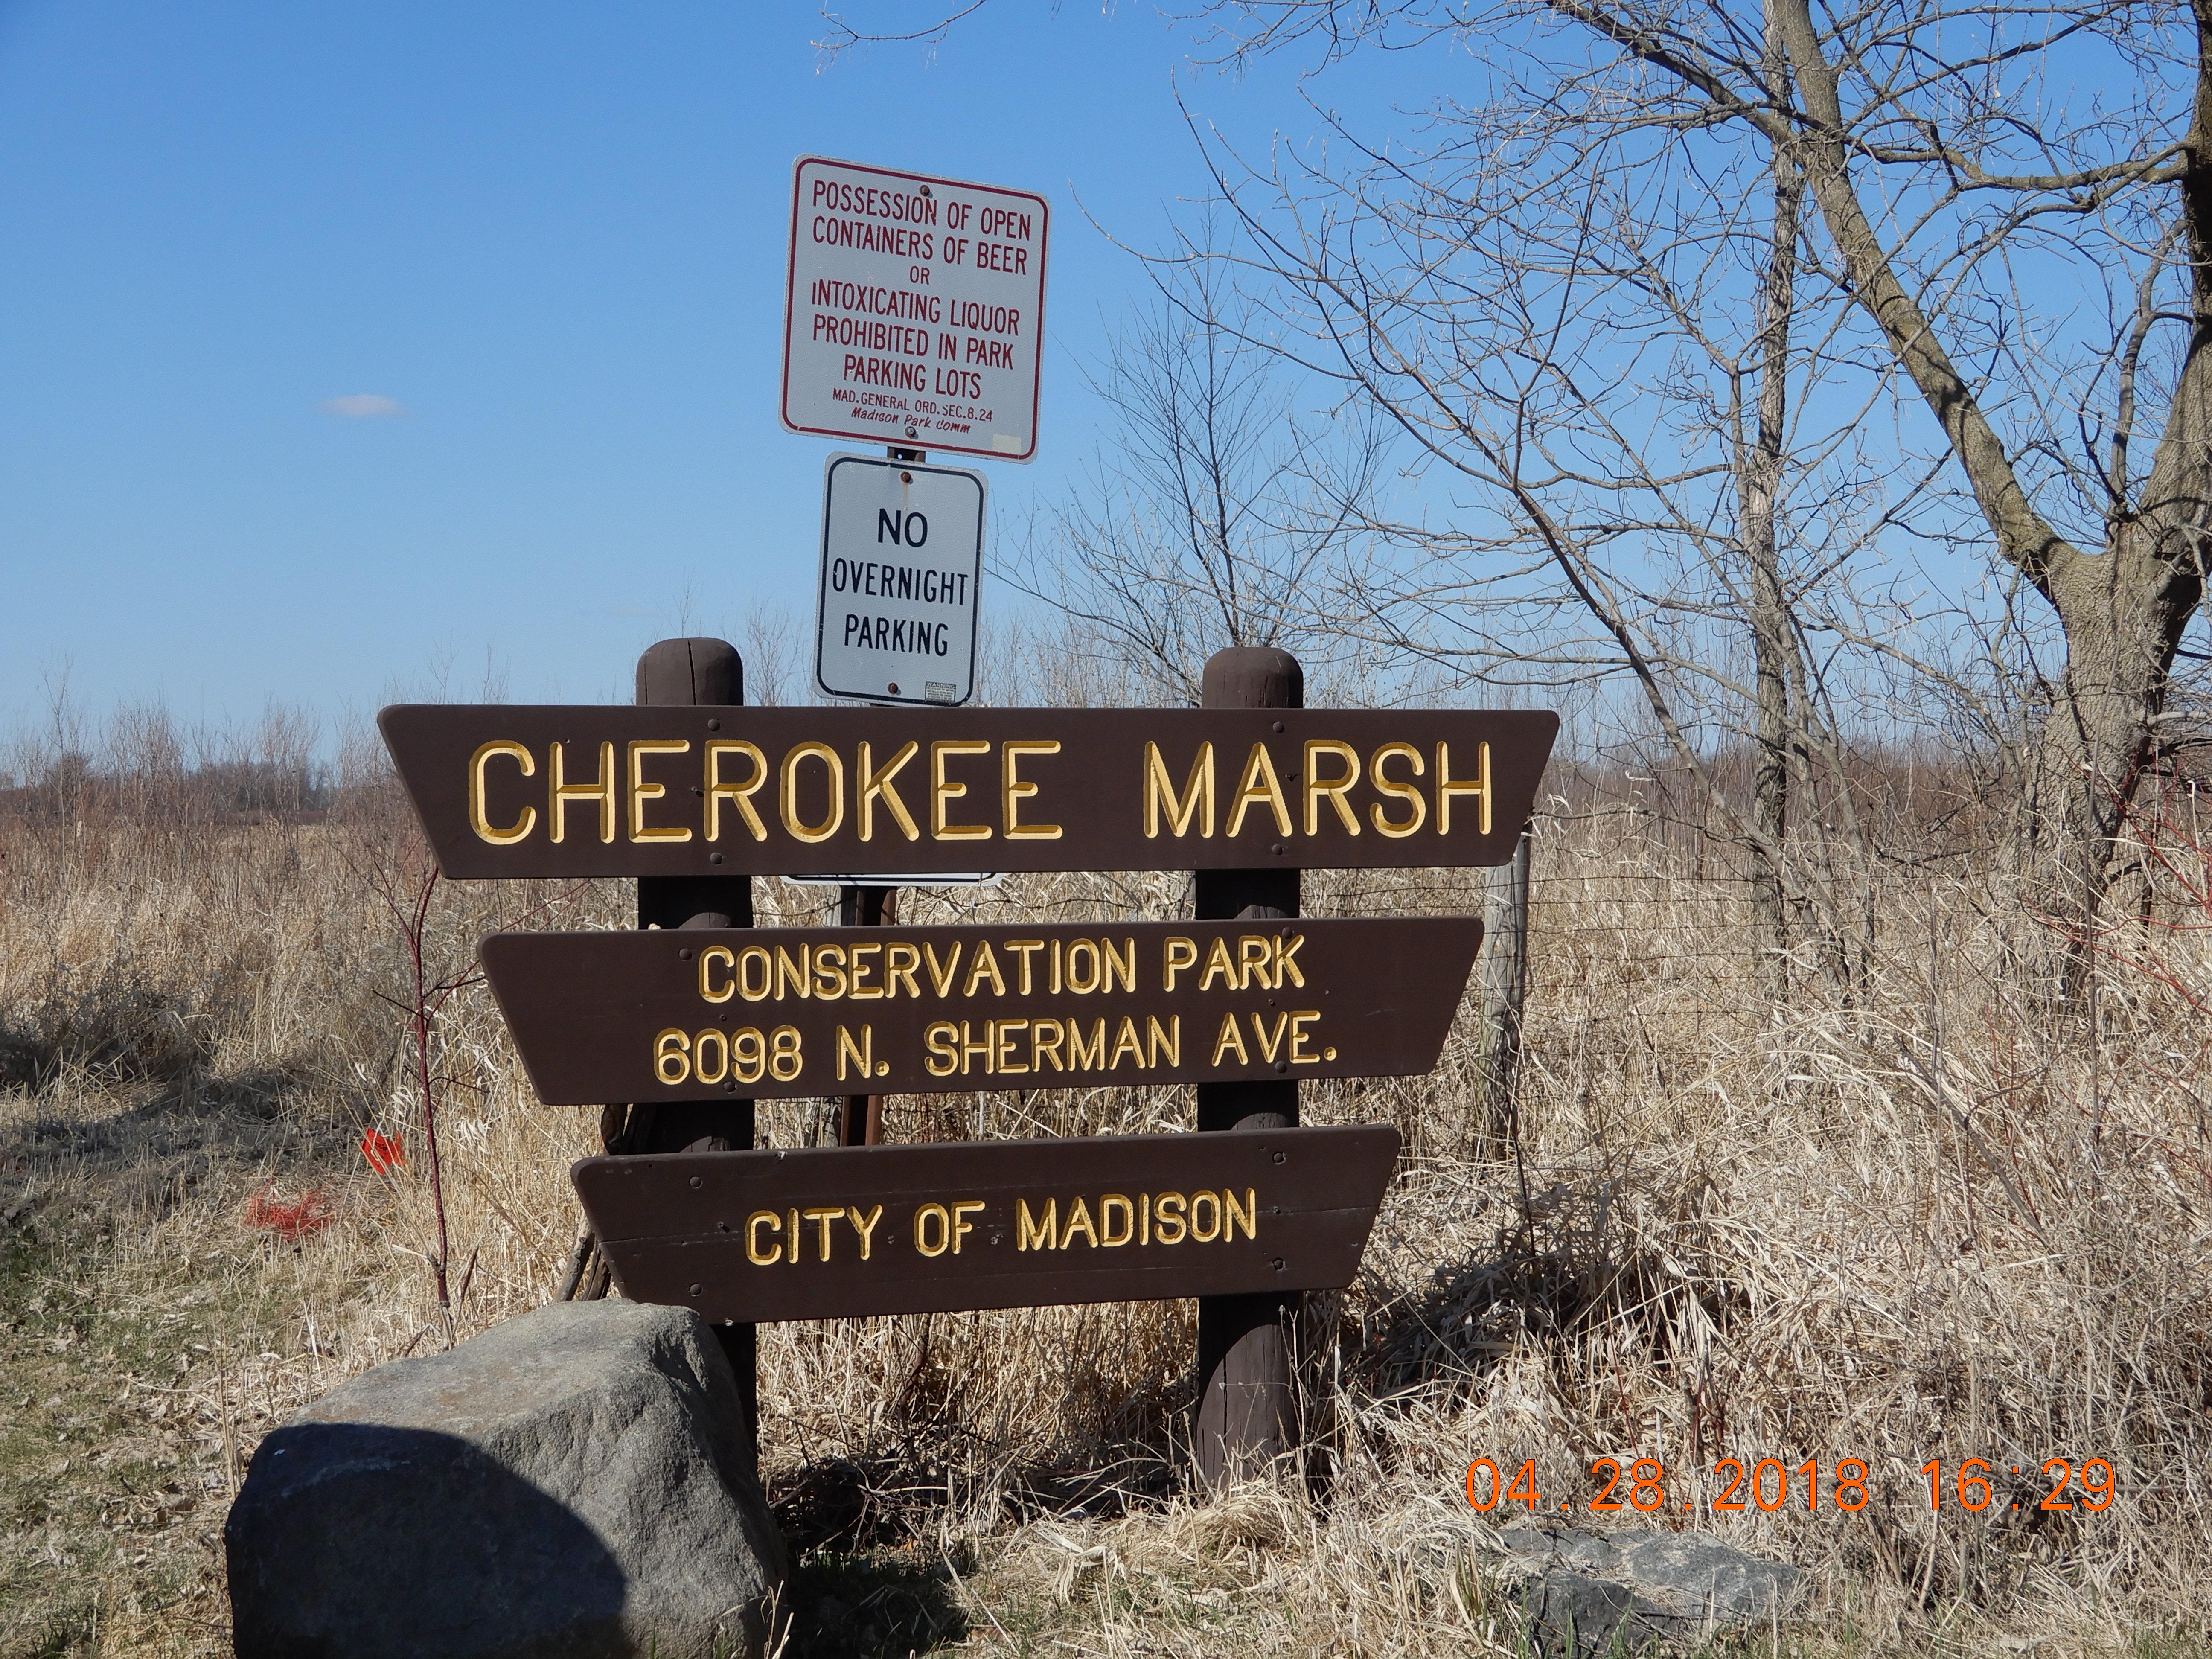 Cherokee marsh park